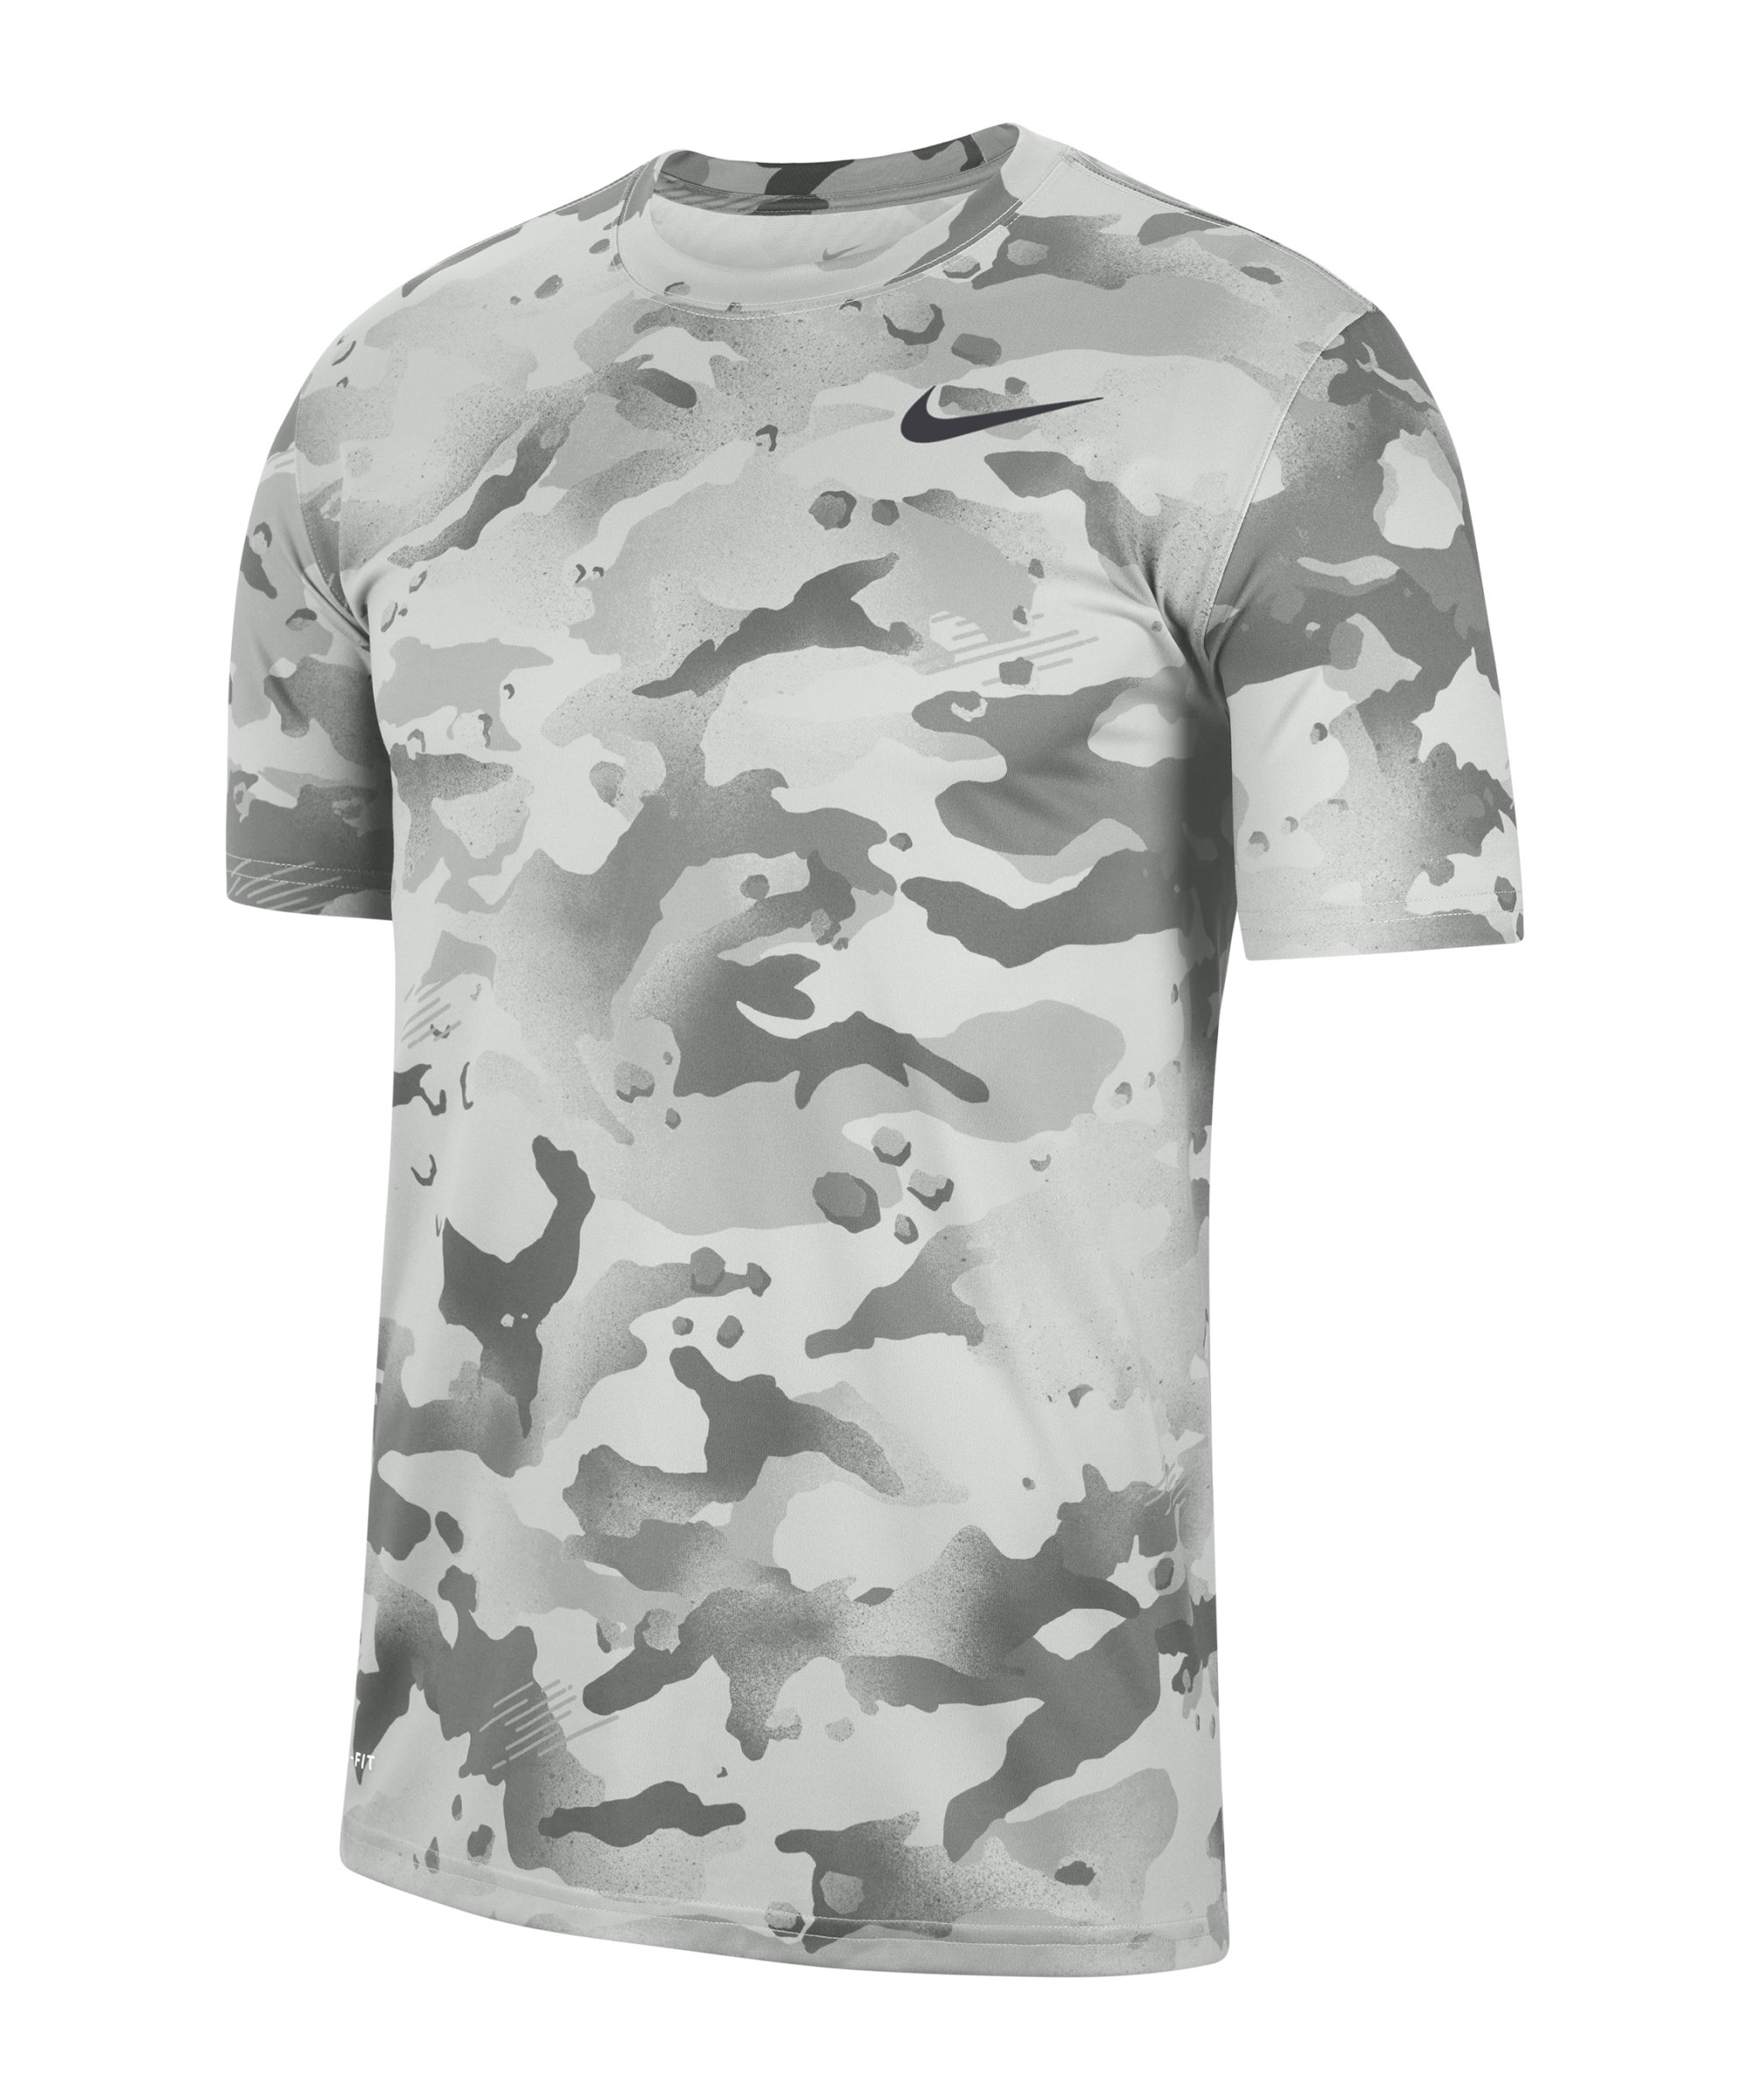 Nike Dry Camo AOP T-Shirt Grau Weiss F084 - grau